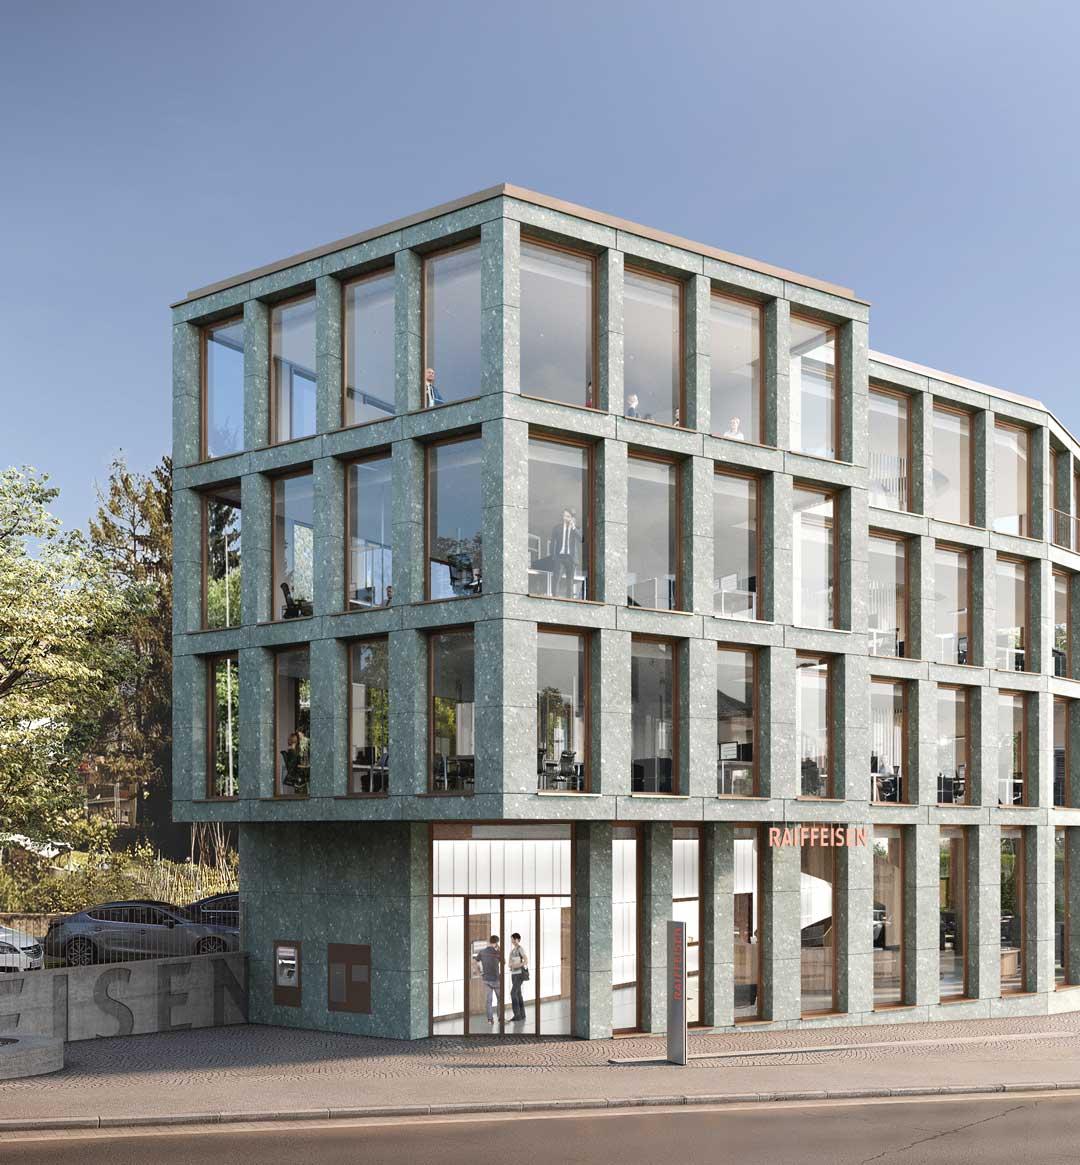 Raiffeisenbank Region Glatt Wallisellen Werubau AG Baumanagement Visulisierung